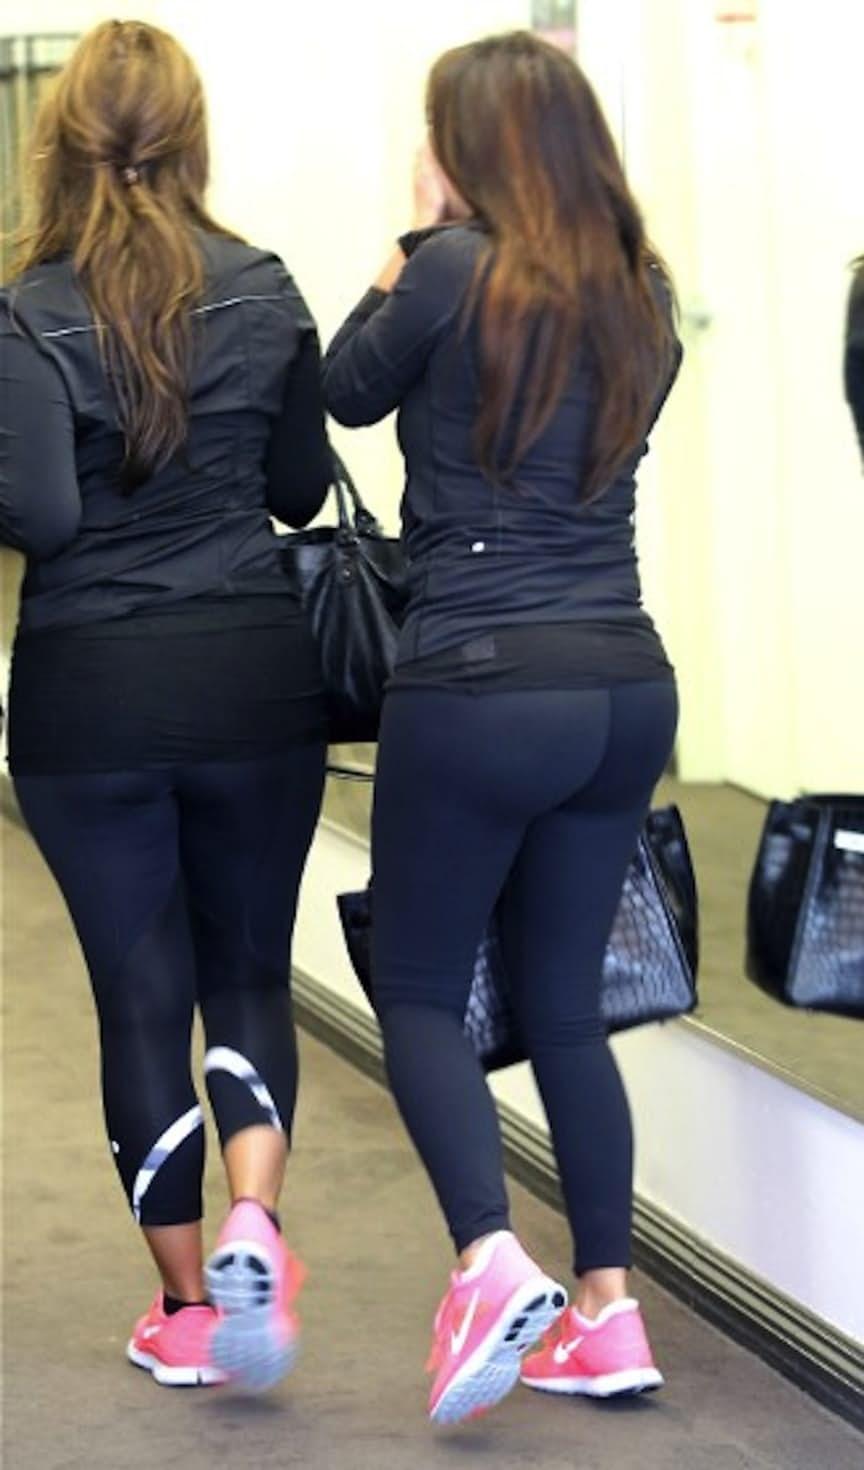 Kims yoga pants